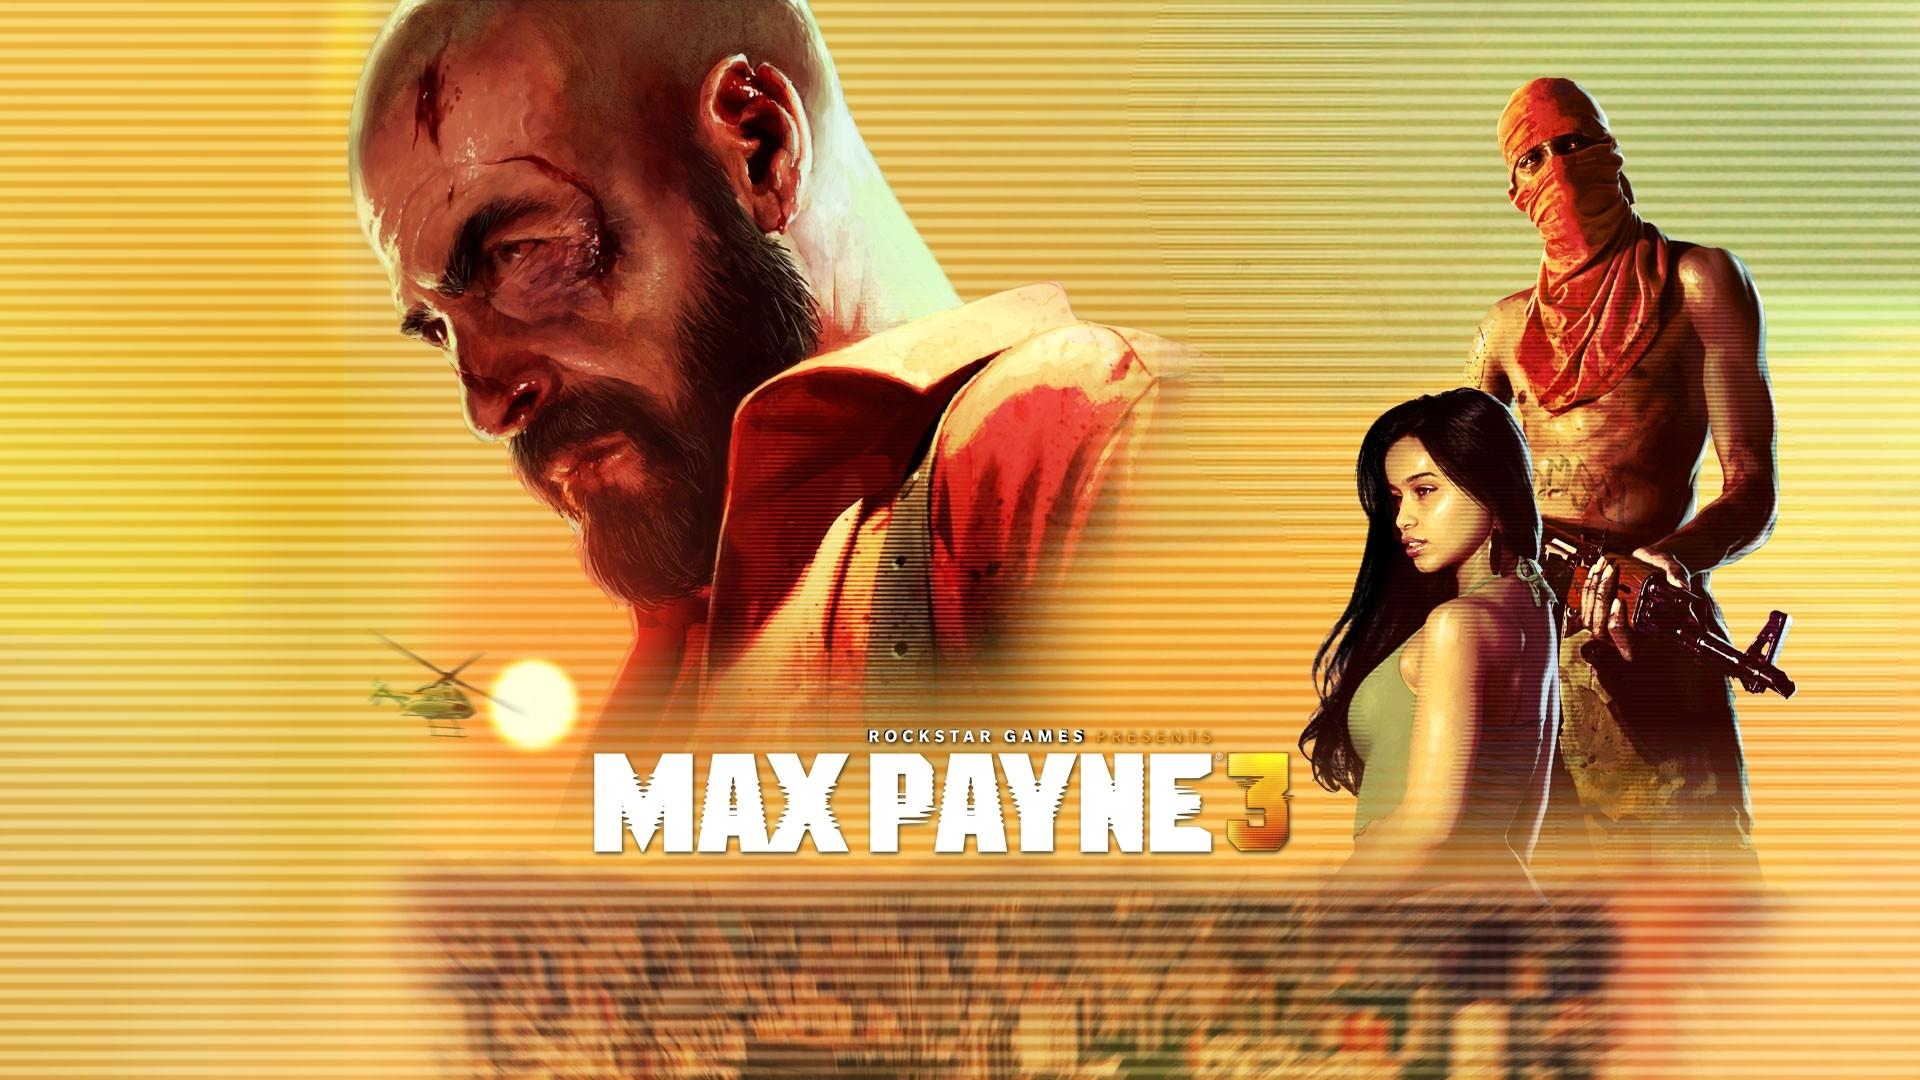 Great Wallpaper Movie Max Payne - 1085563-vertical-max-payne-wallpaper-1920x1080  2018_682886.jpg